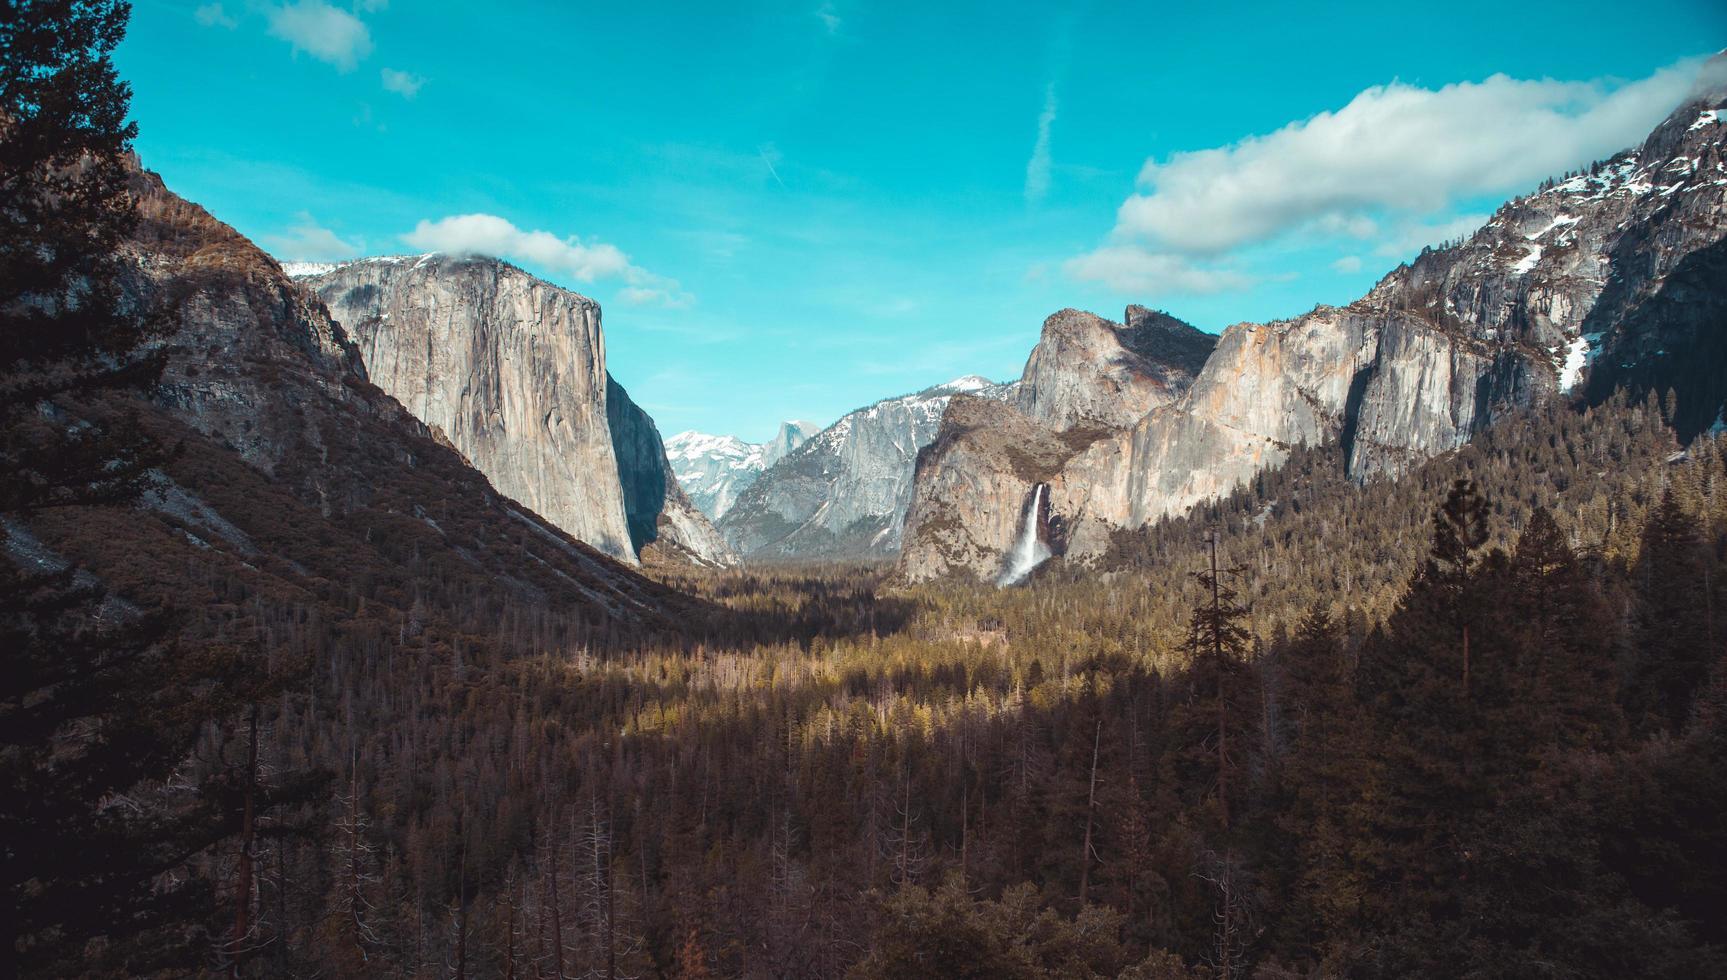 Landscape in the Yosemite National Park photo